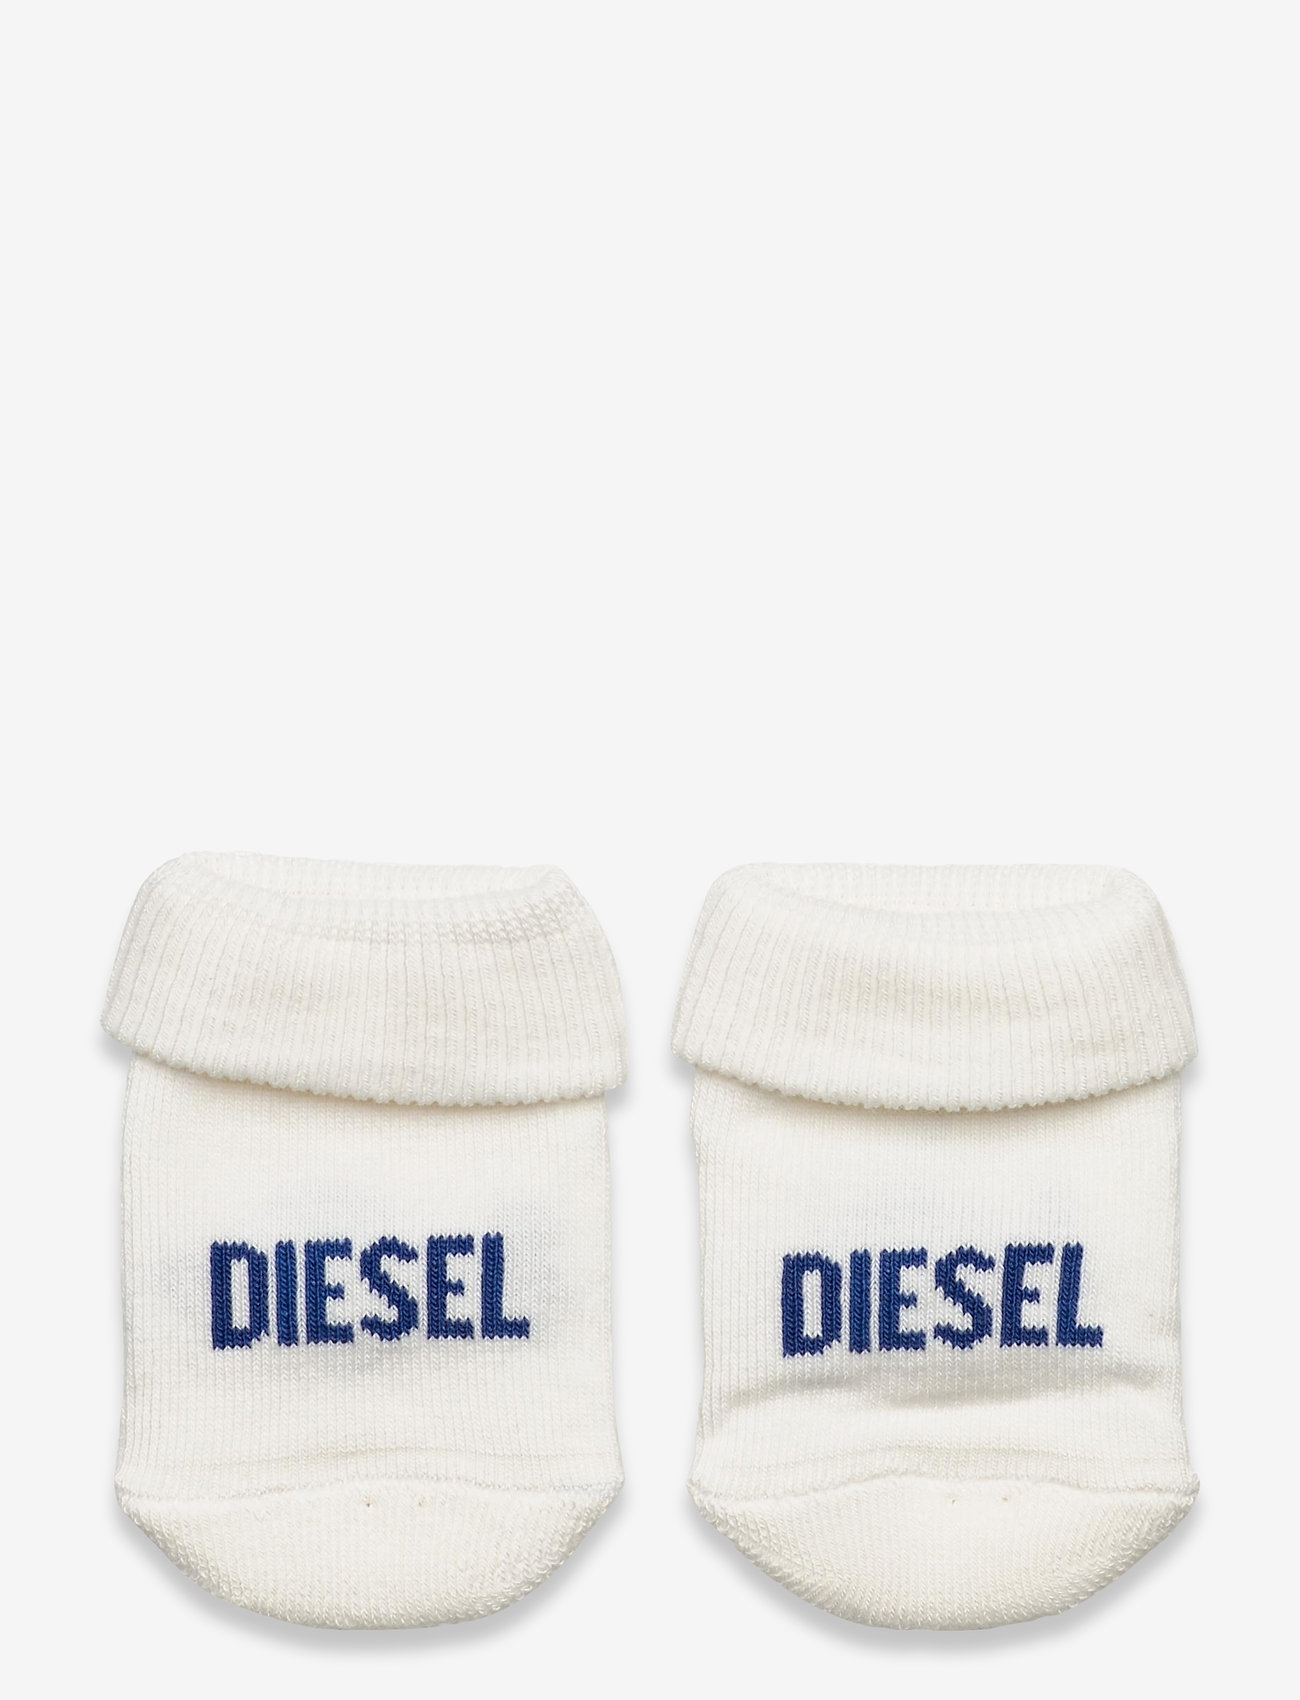 Diesel - ZEBET-NB SOCKS - skarpetki - colore k101 + k8ii - 0